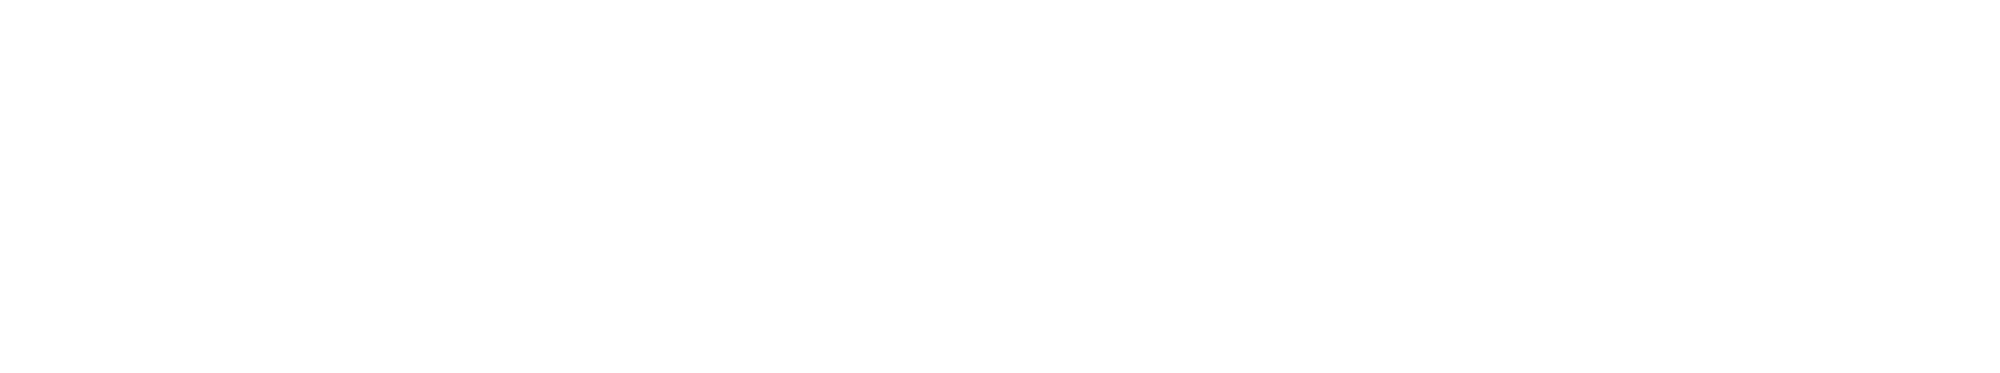 mezmedia logo